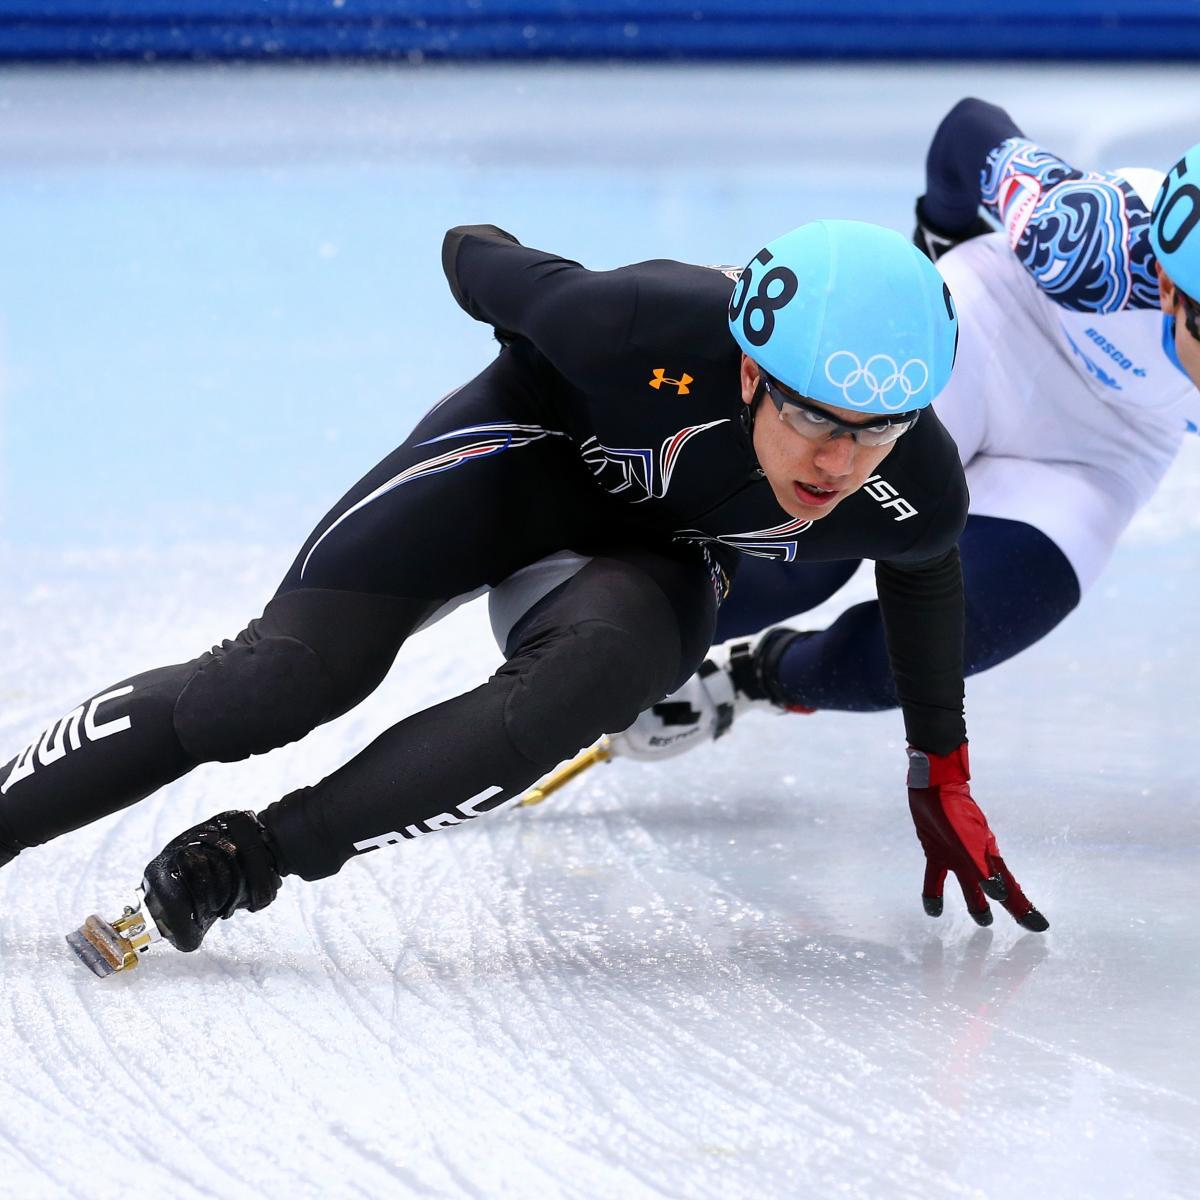 JR Celski Wins Silver Medal in Men's 5000-Meter Relay at Sochi 2014 Olympics